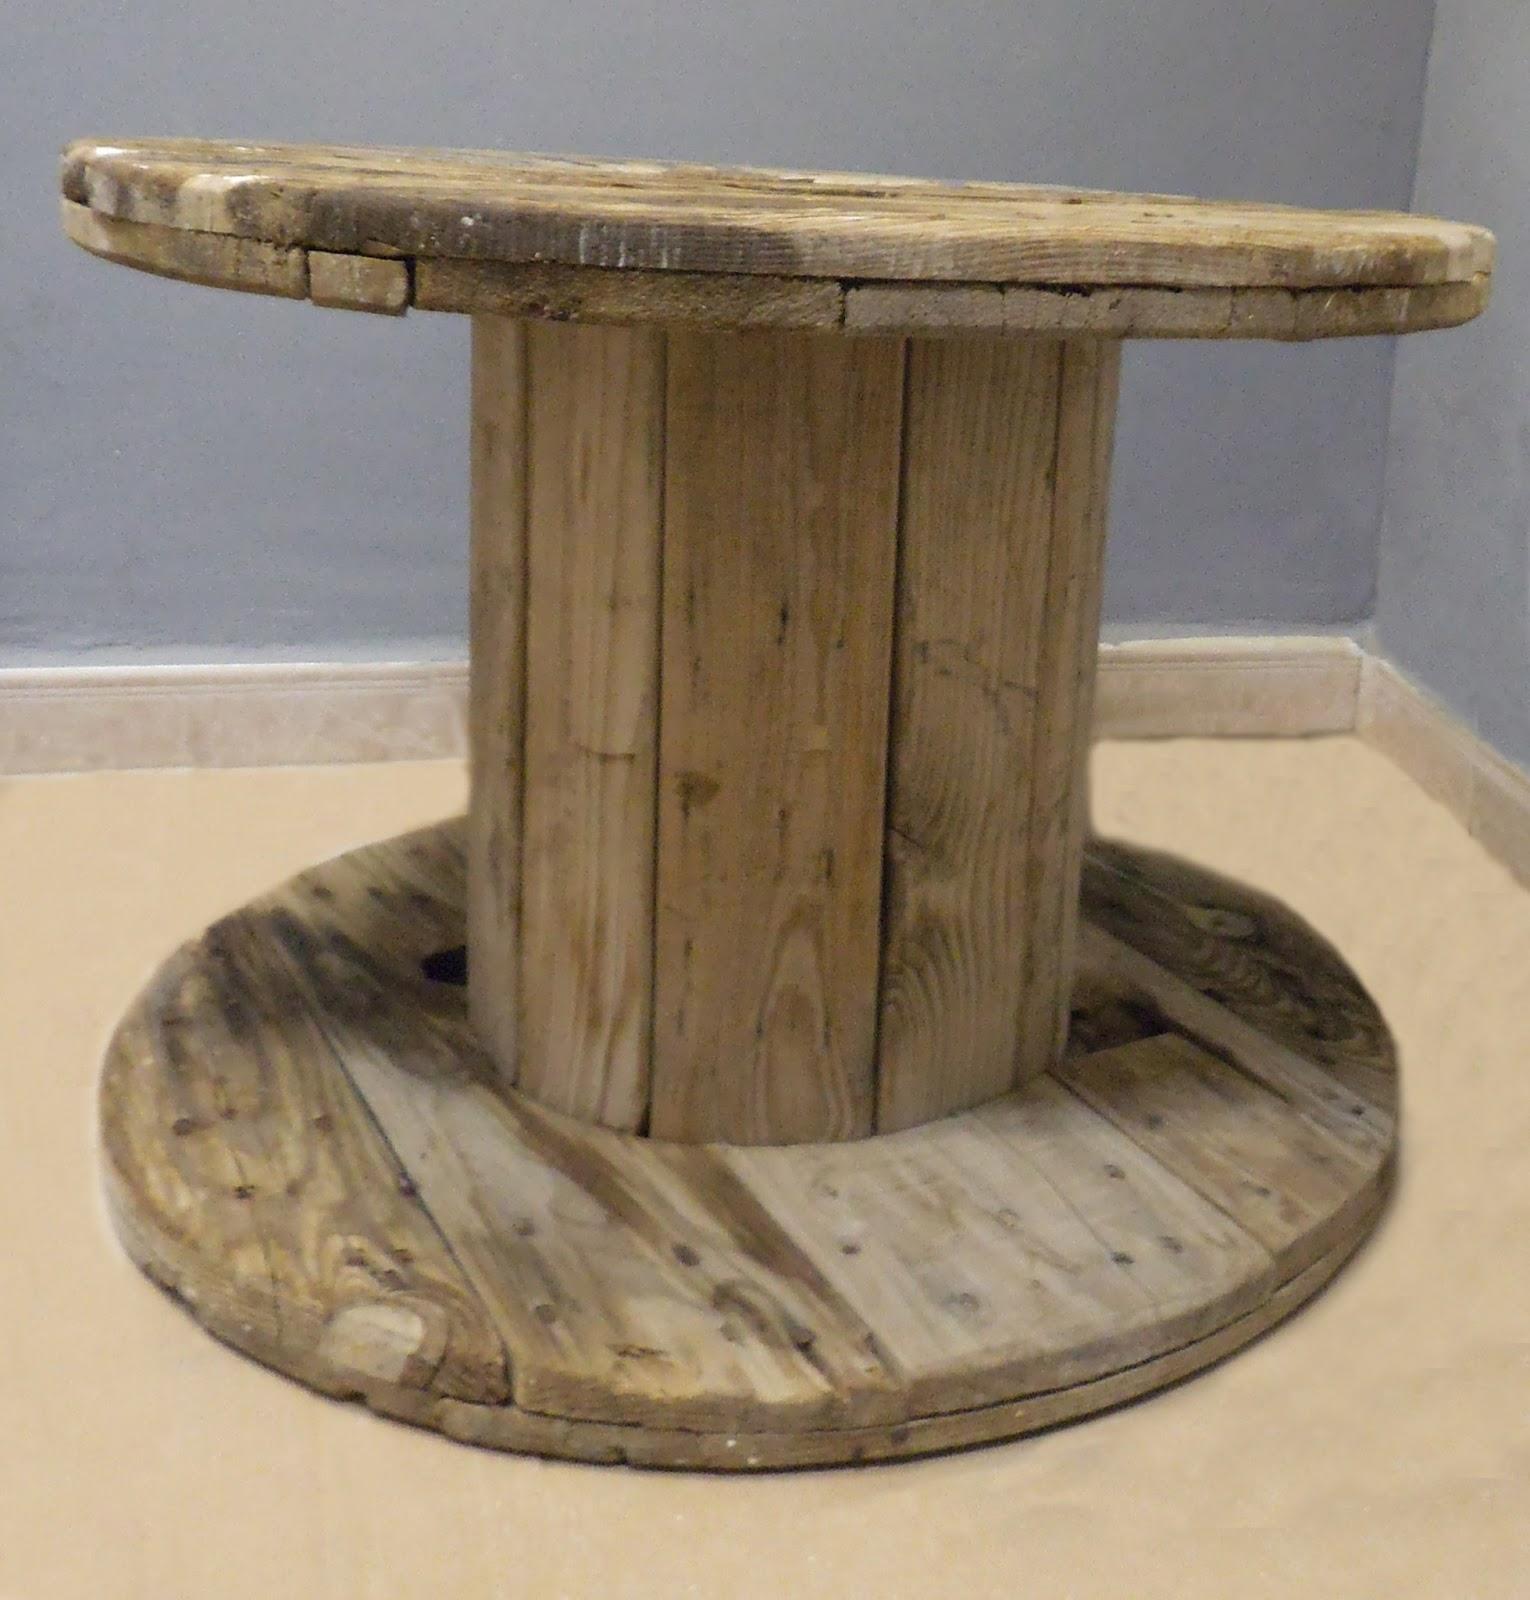 Renovarte muebles curso de restauraci n de muebles for Clases de restauracion de muebles